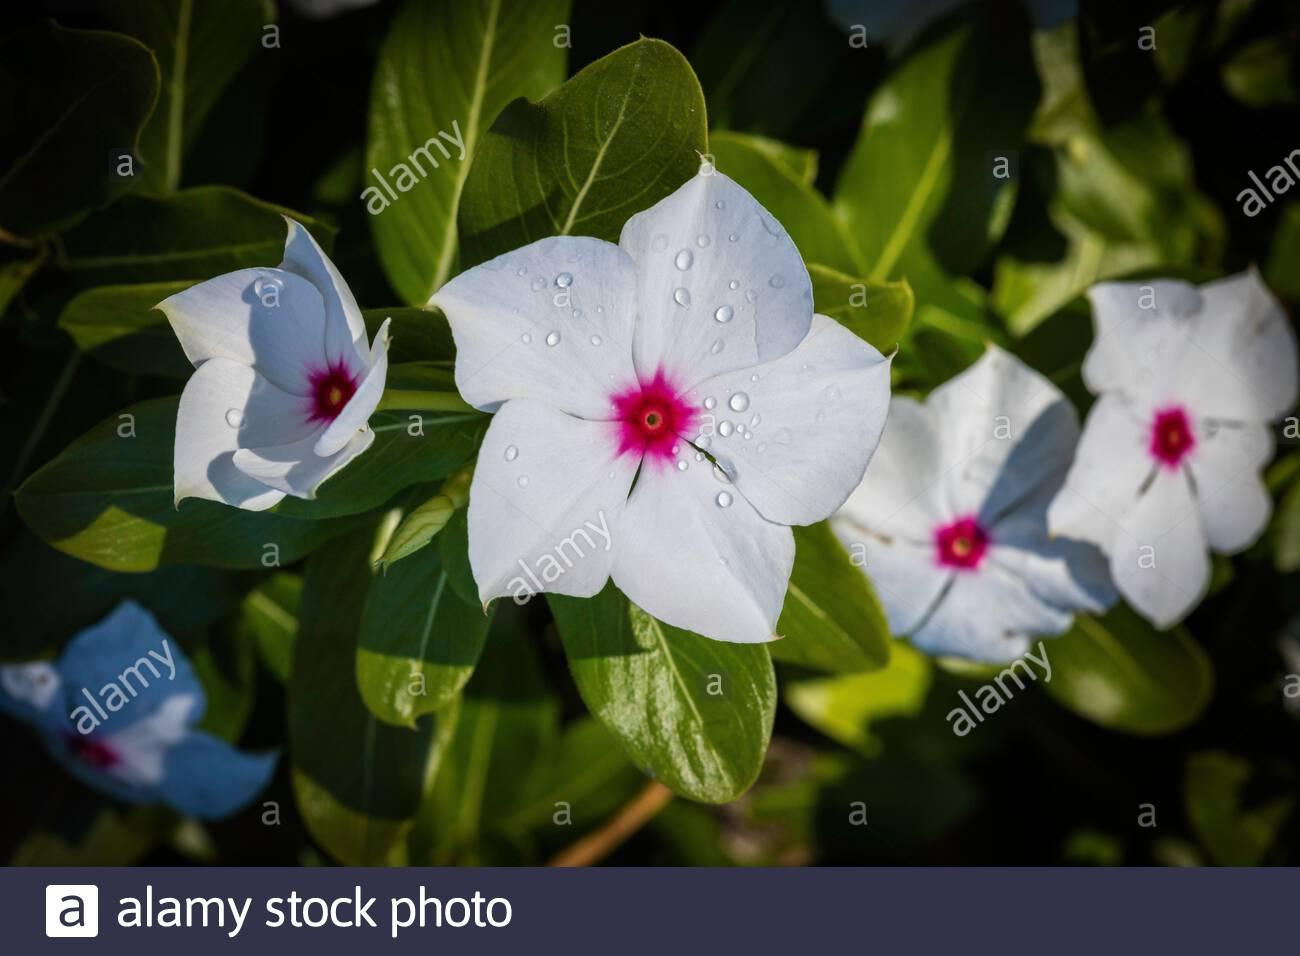 catharanthus-roseus-madagascar-periwinkl